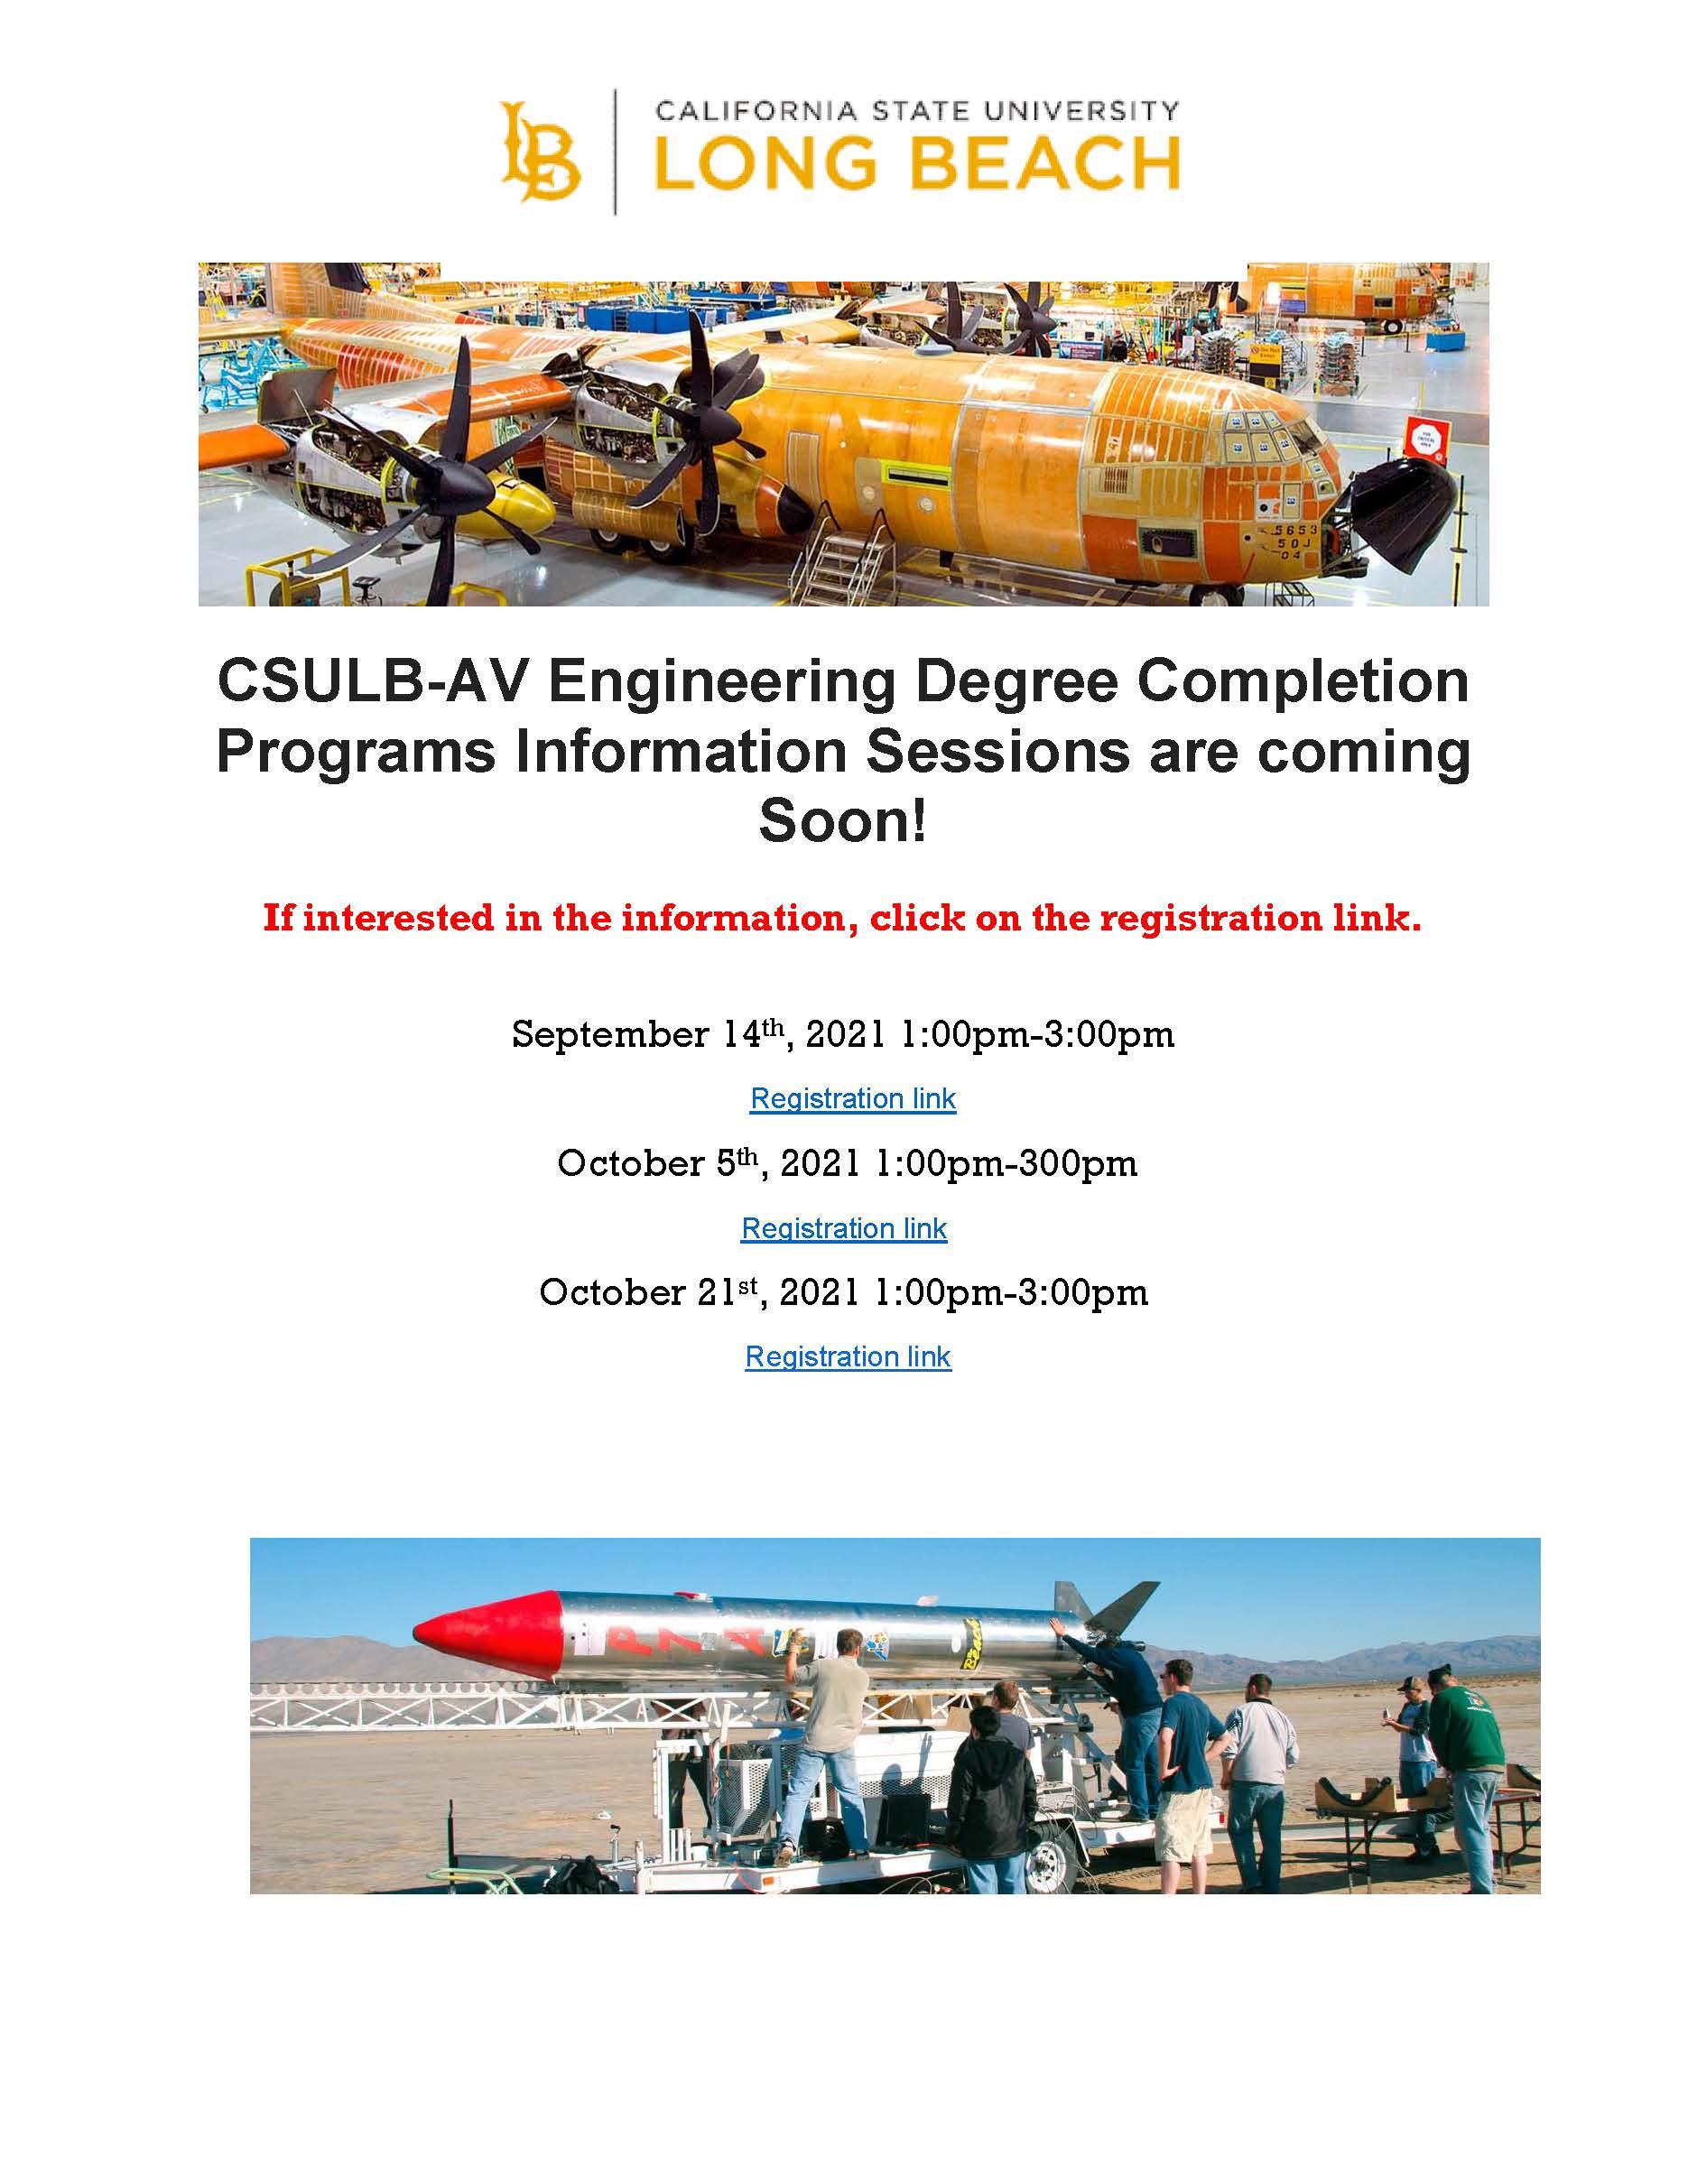 CSULB Engineering Rep visits Fall 2021